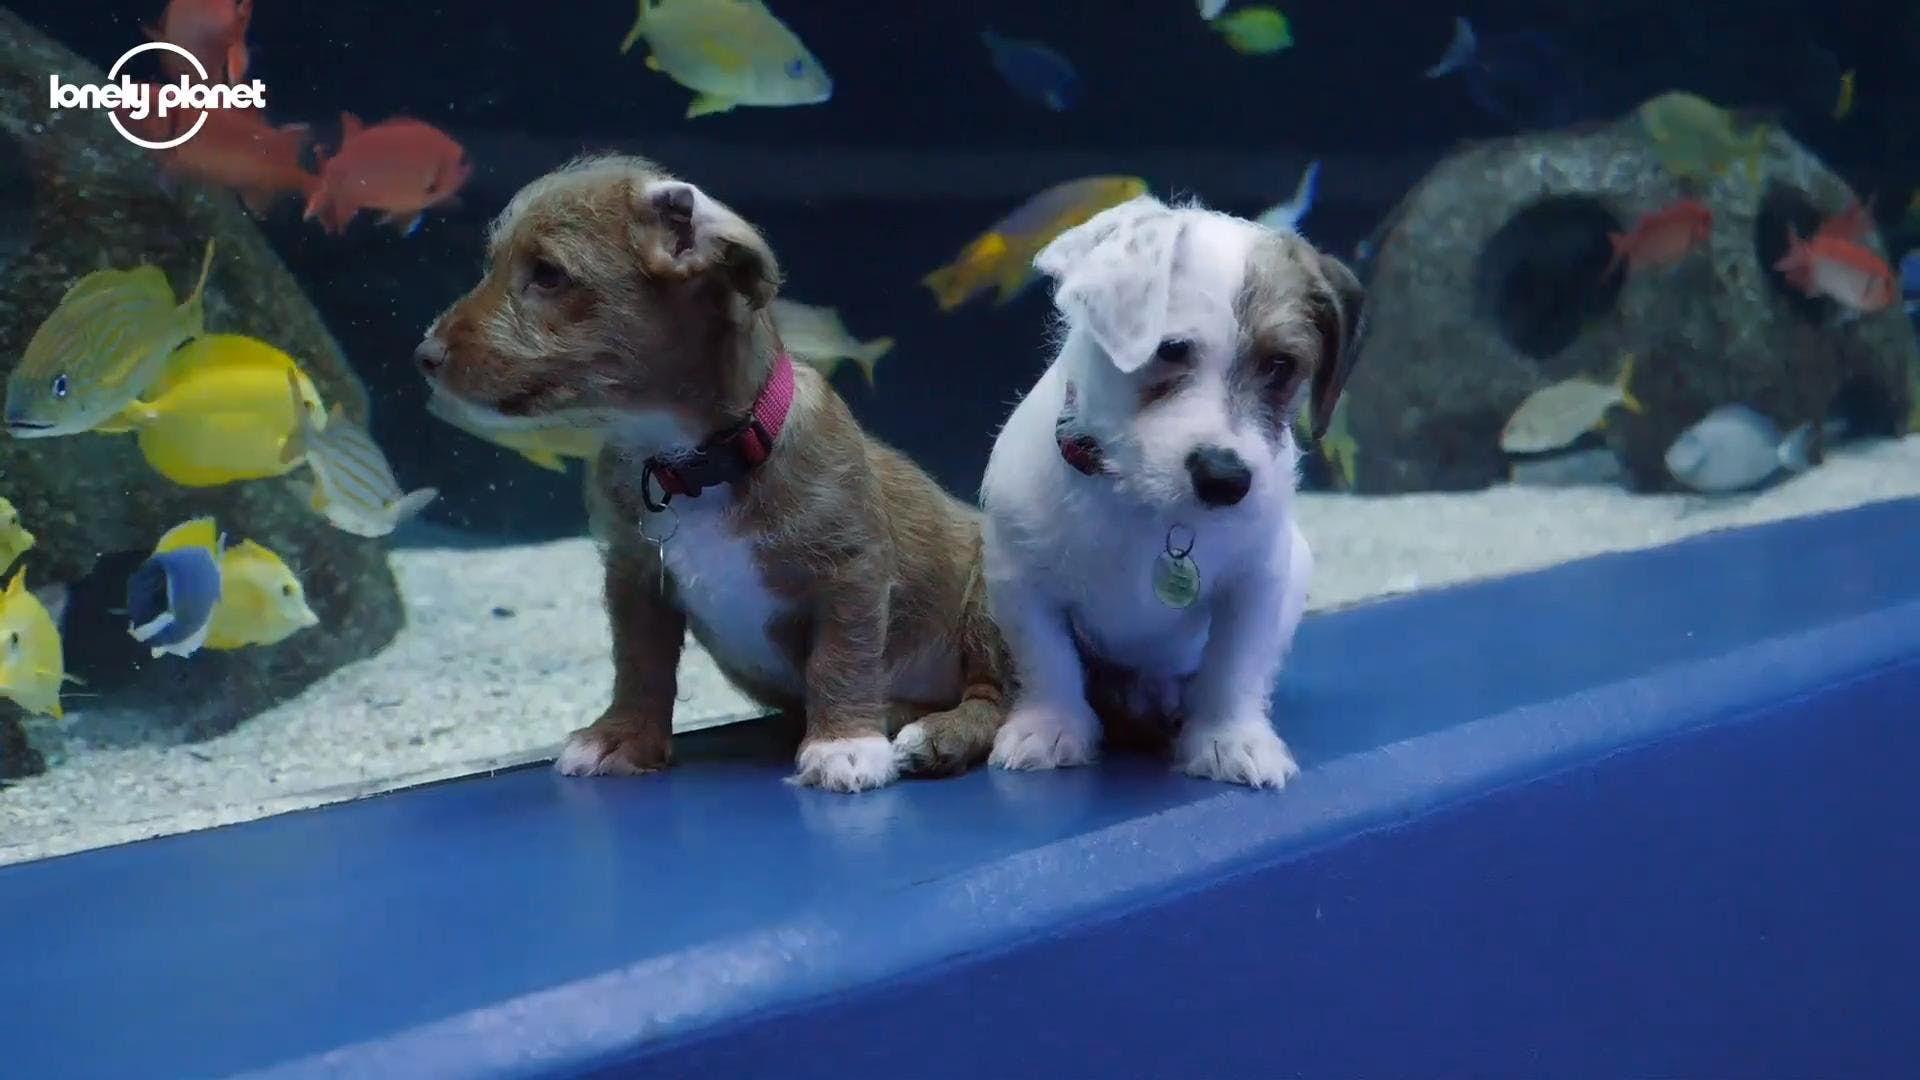 Watch These Adorable Puppies Roam Around An Aquarium